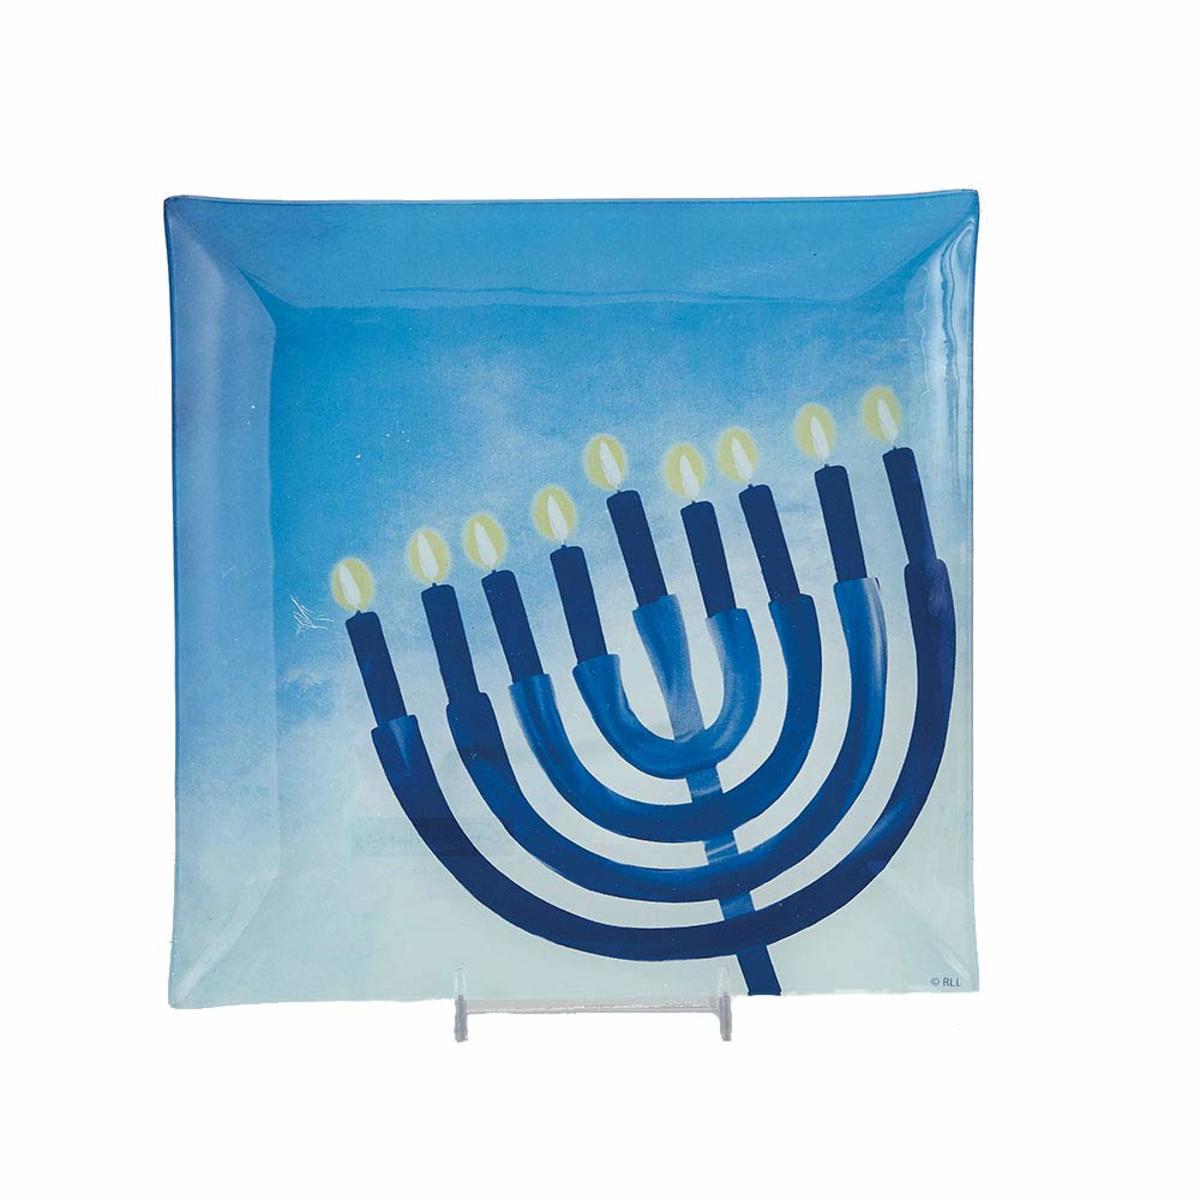 Hanukkah glass serving tray